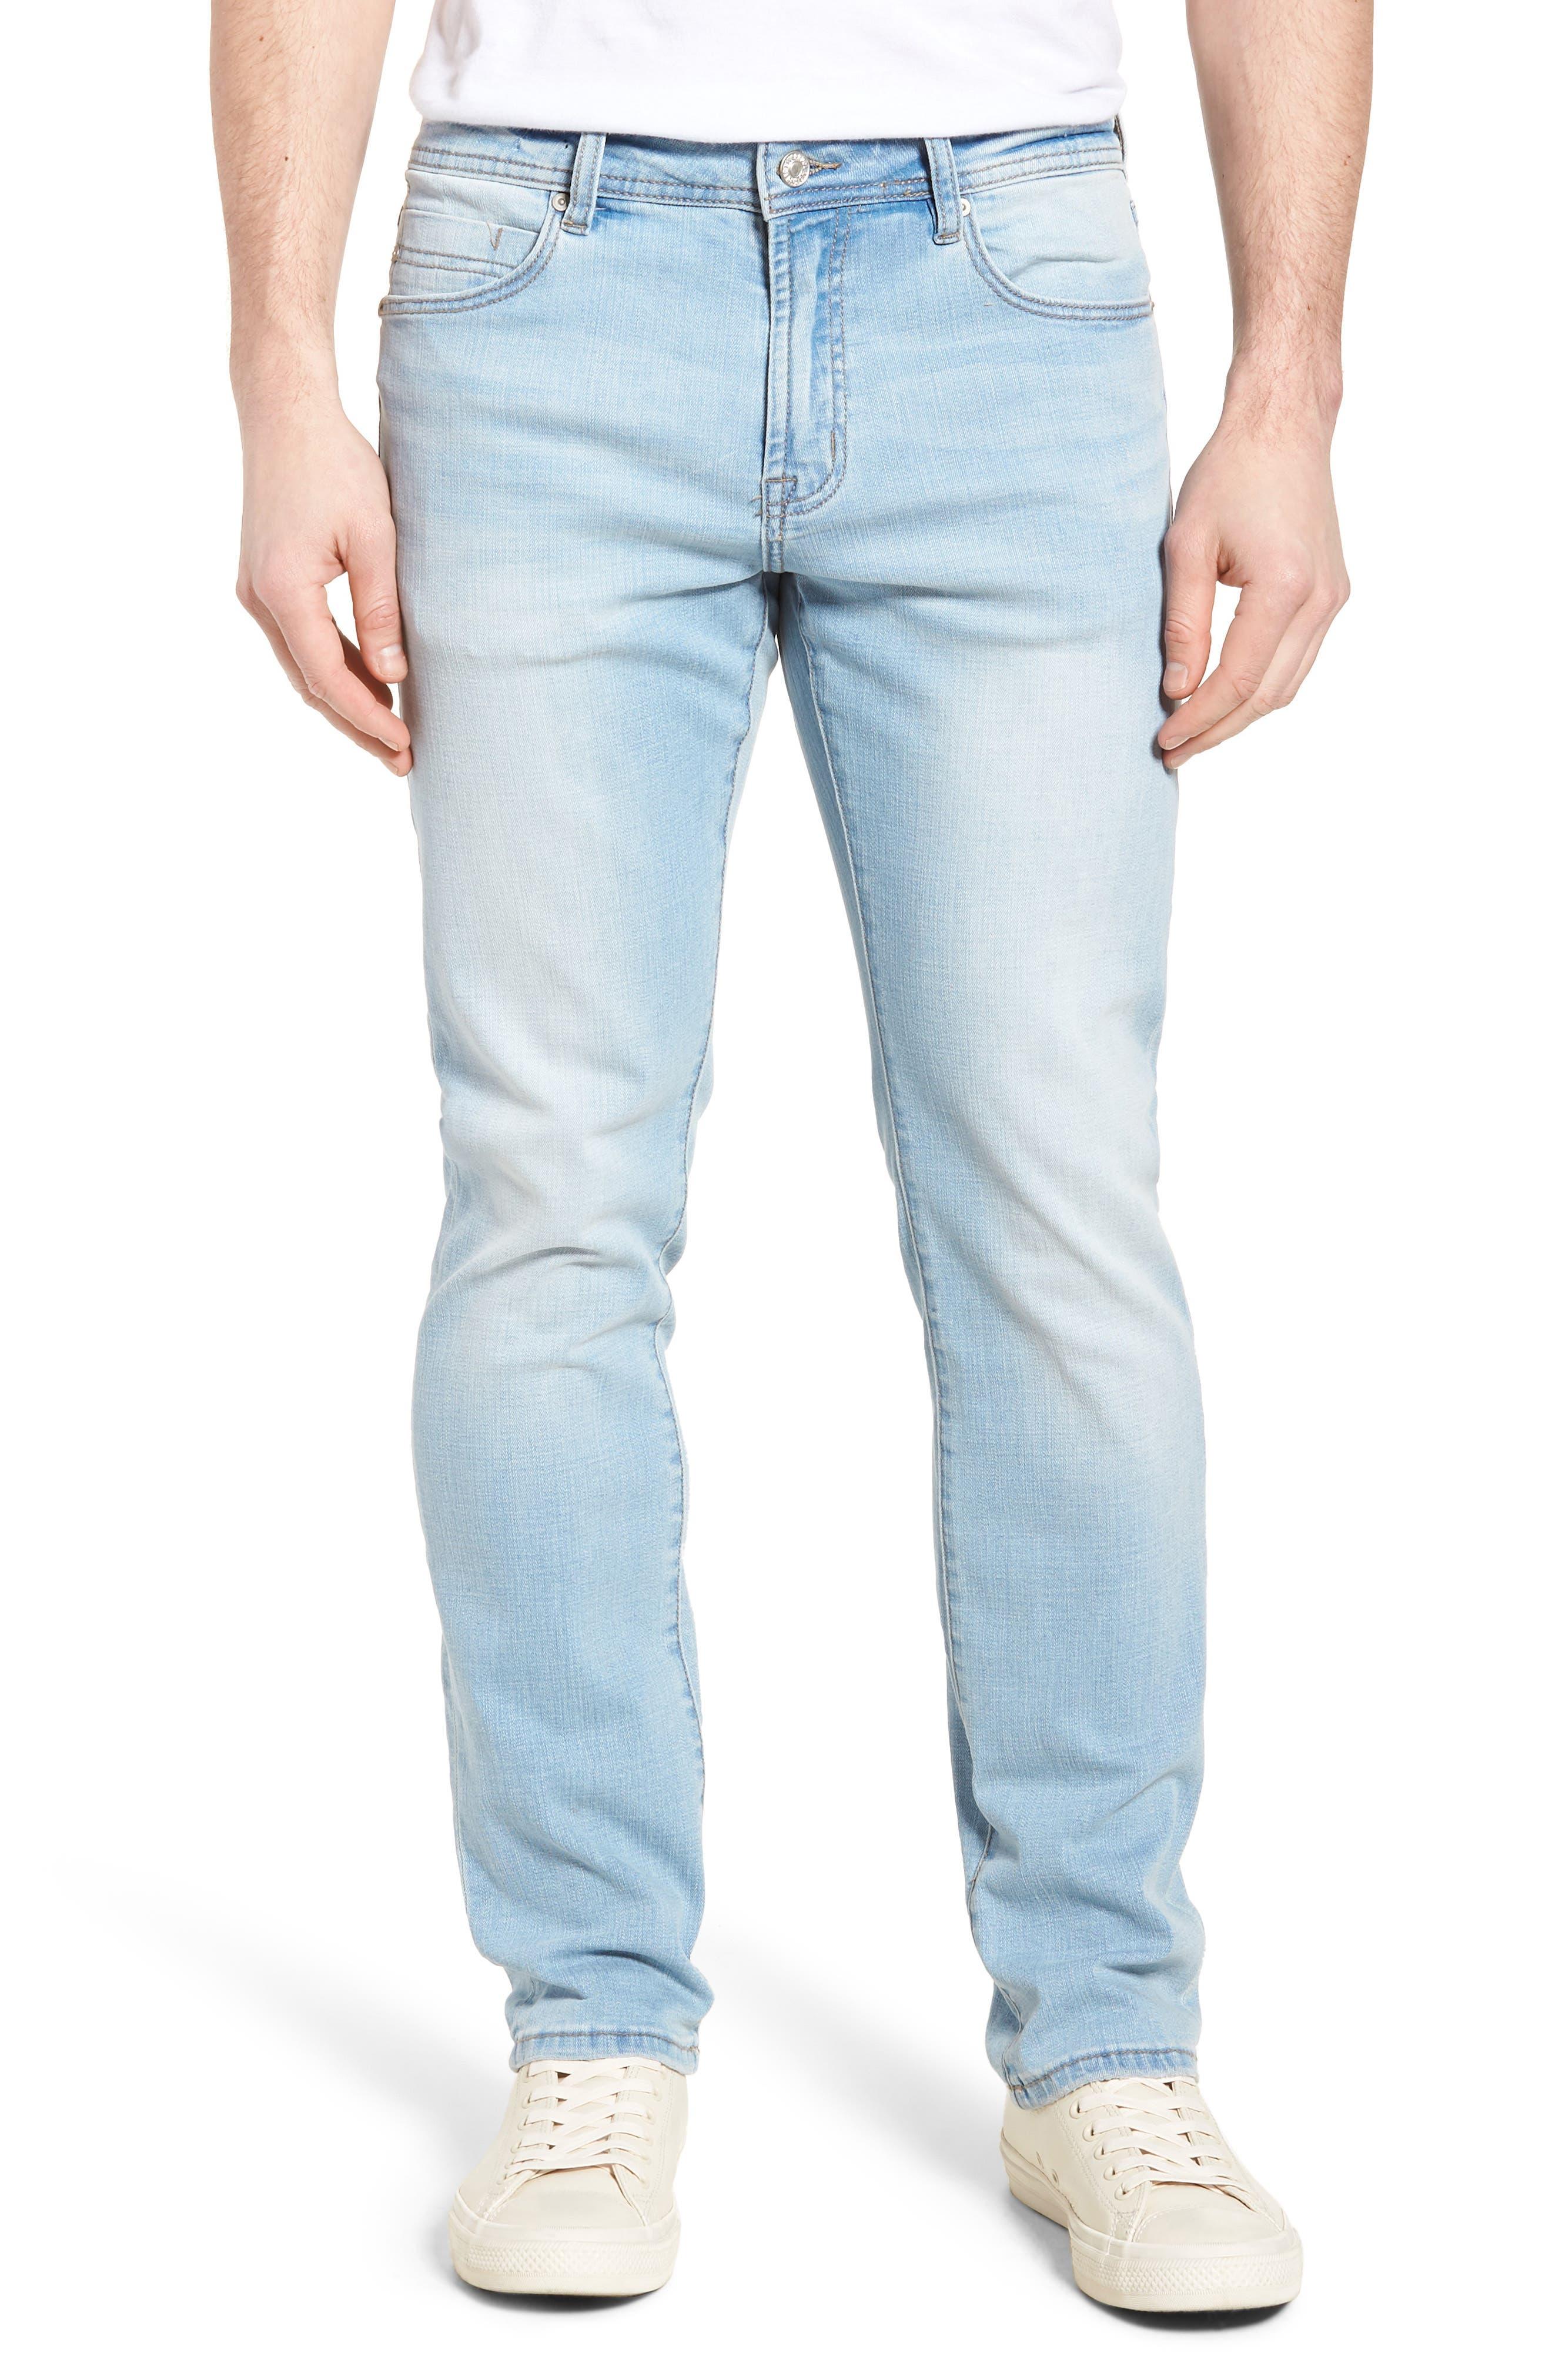 Jeans Co. Straight Leg Jeans,                         Main,                         color, Riverside Light